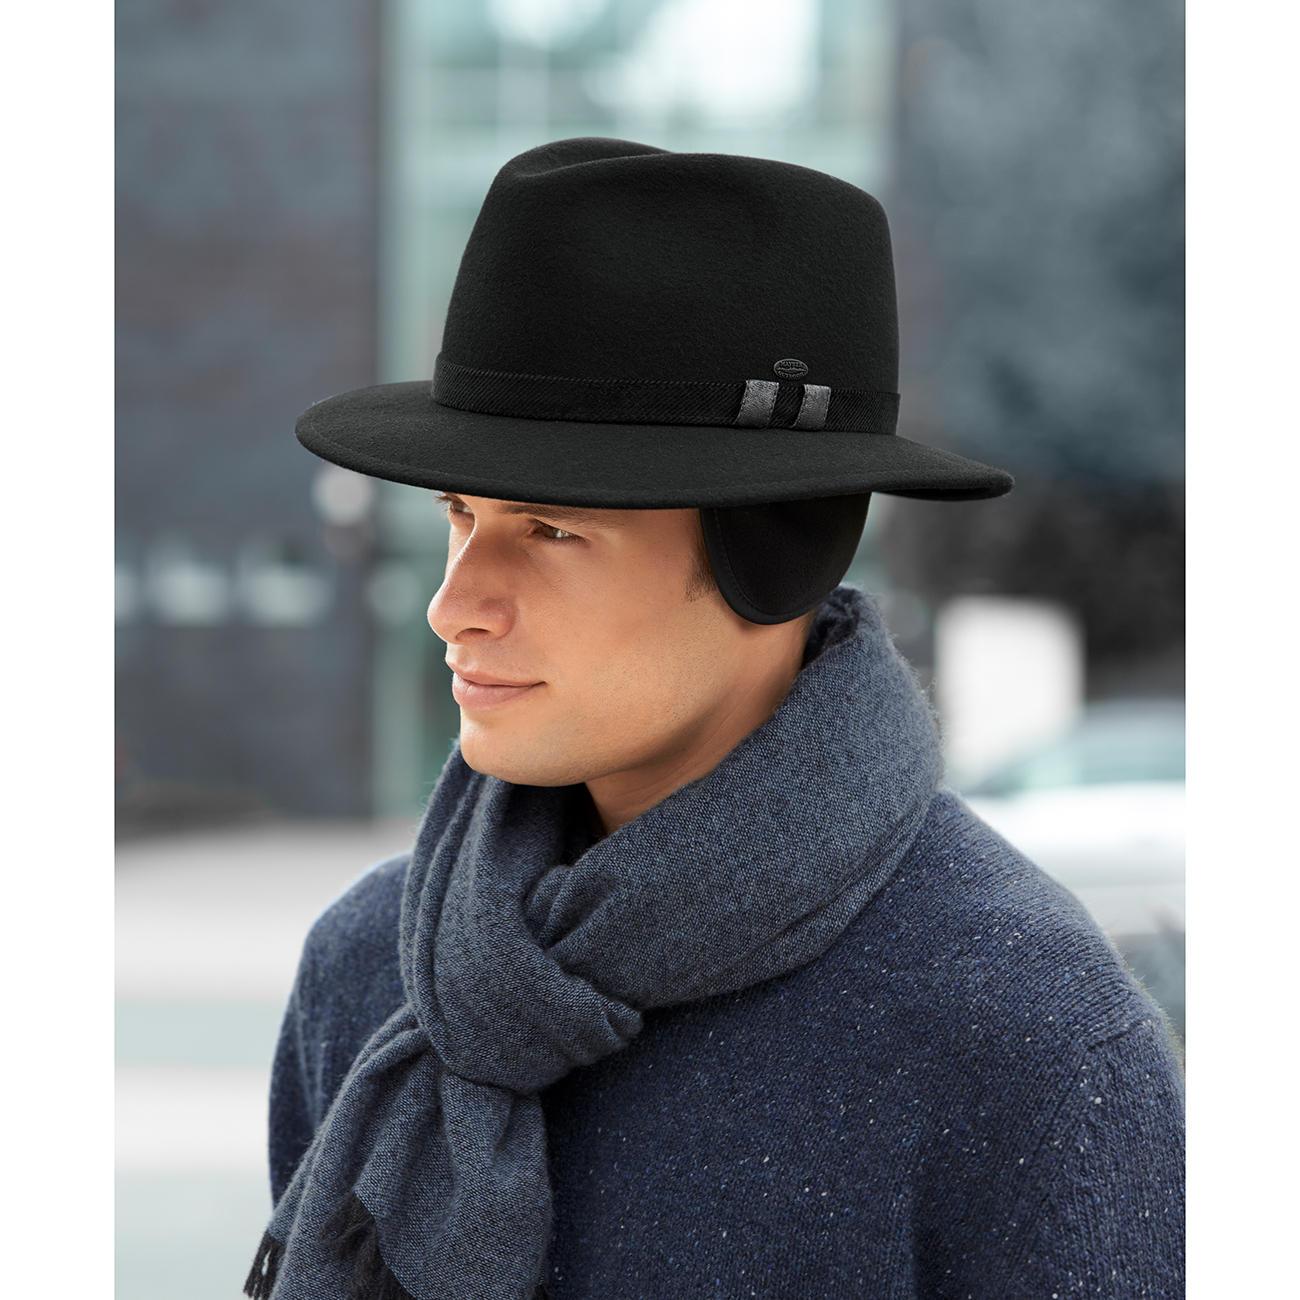 mayser winterhut mode klassiker entdecken  Neue Mayser Grau Hut Herren Outlet P 2104 #13